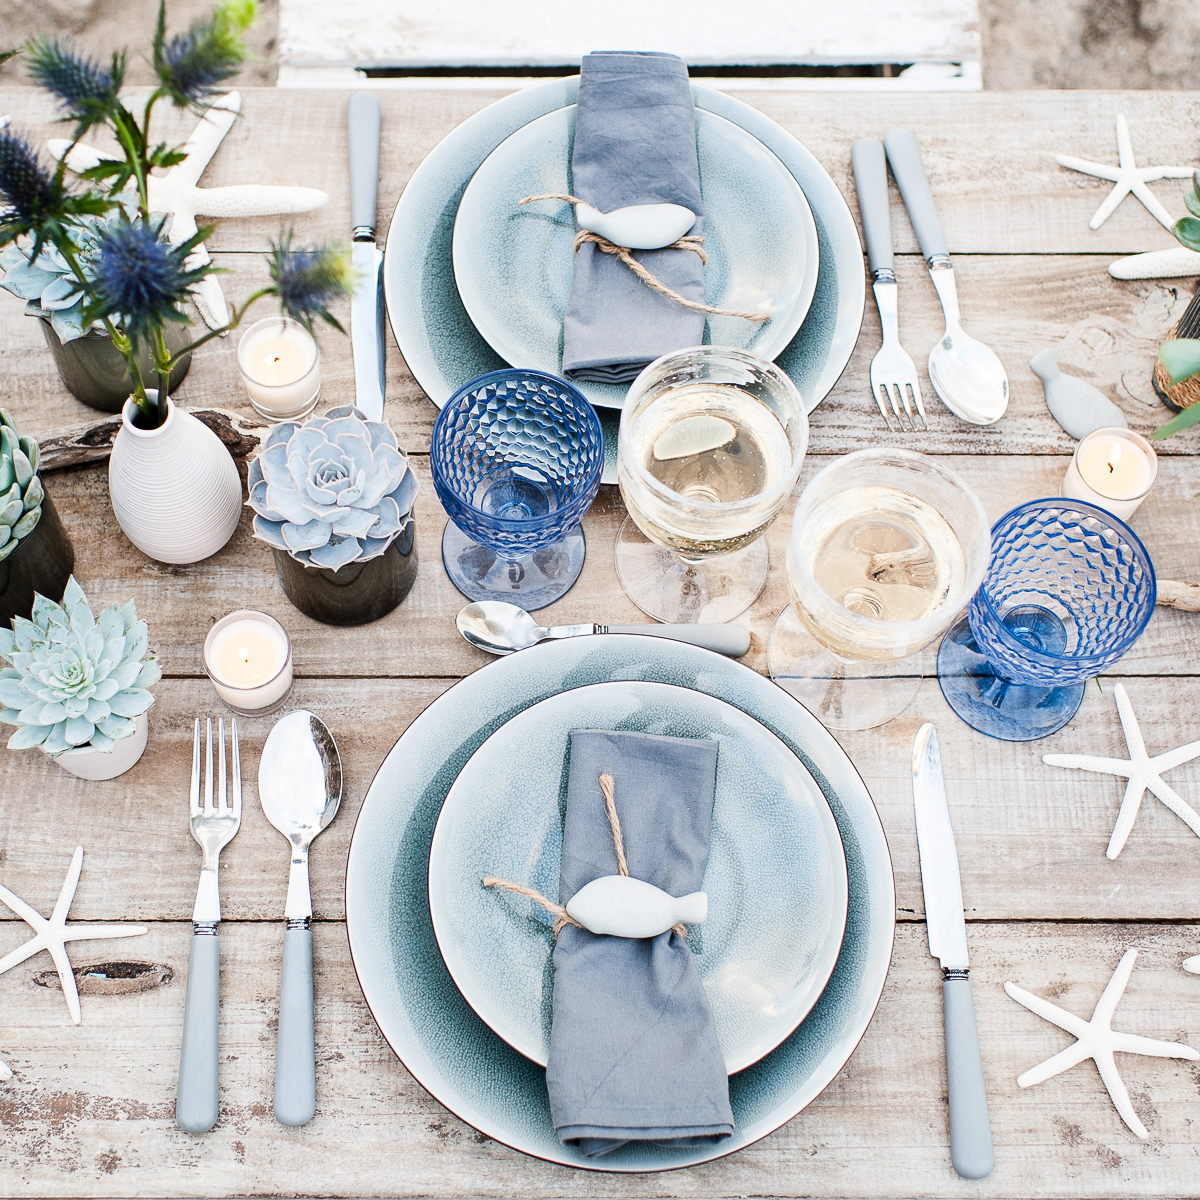 calista-one-lista-de-bodas-online-blog-de-bodas-inspiracion-decoracion-mesas-paula-franco-11